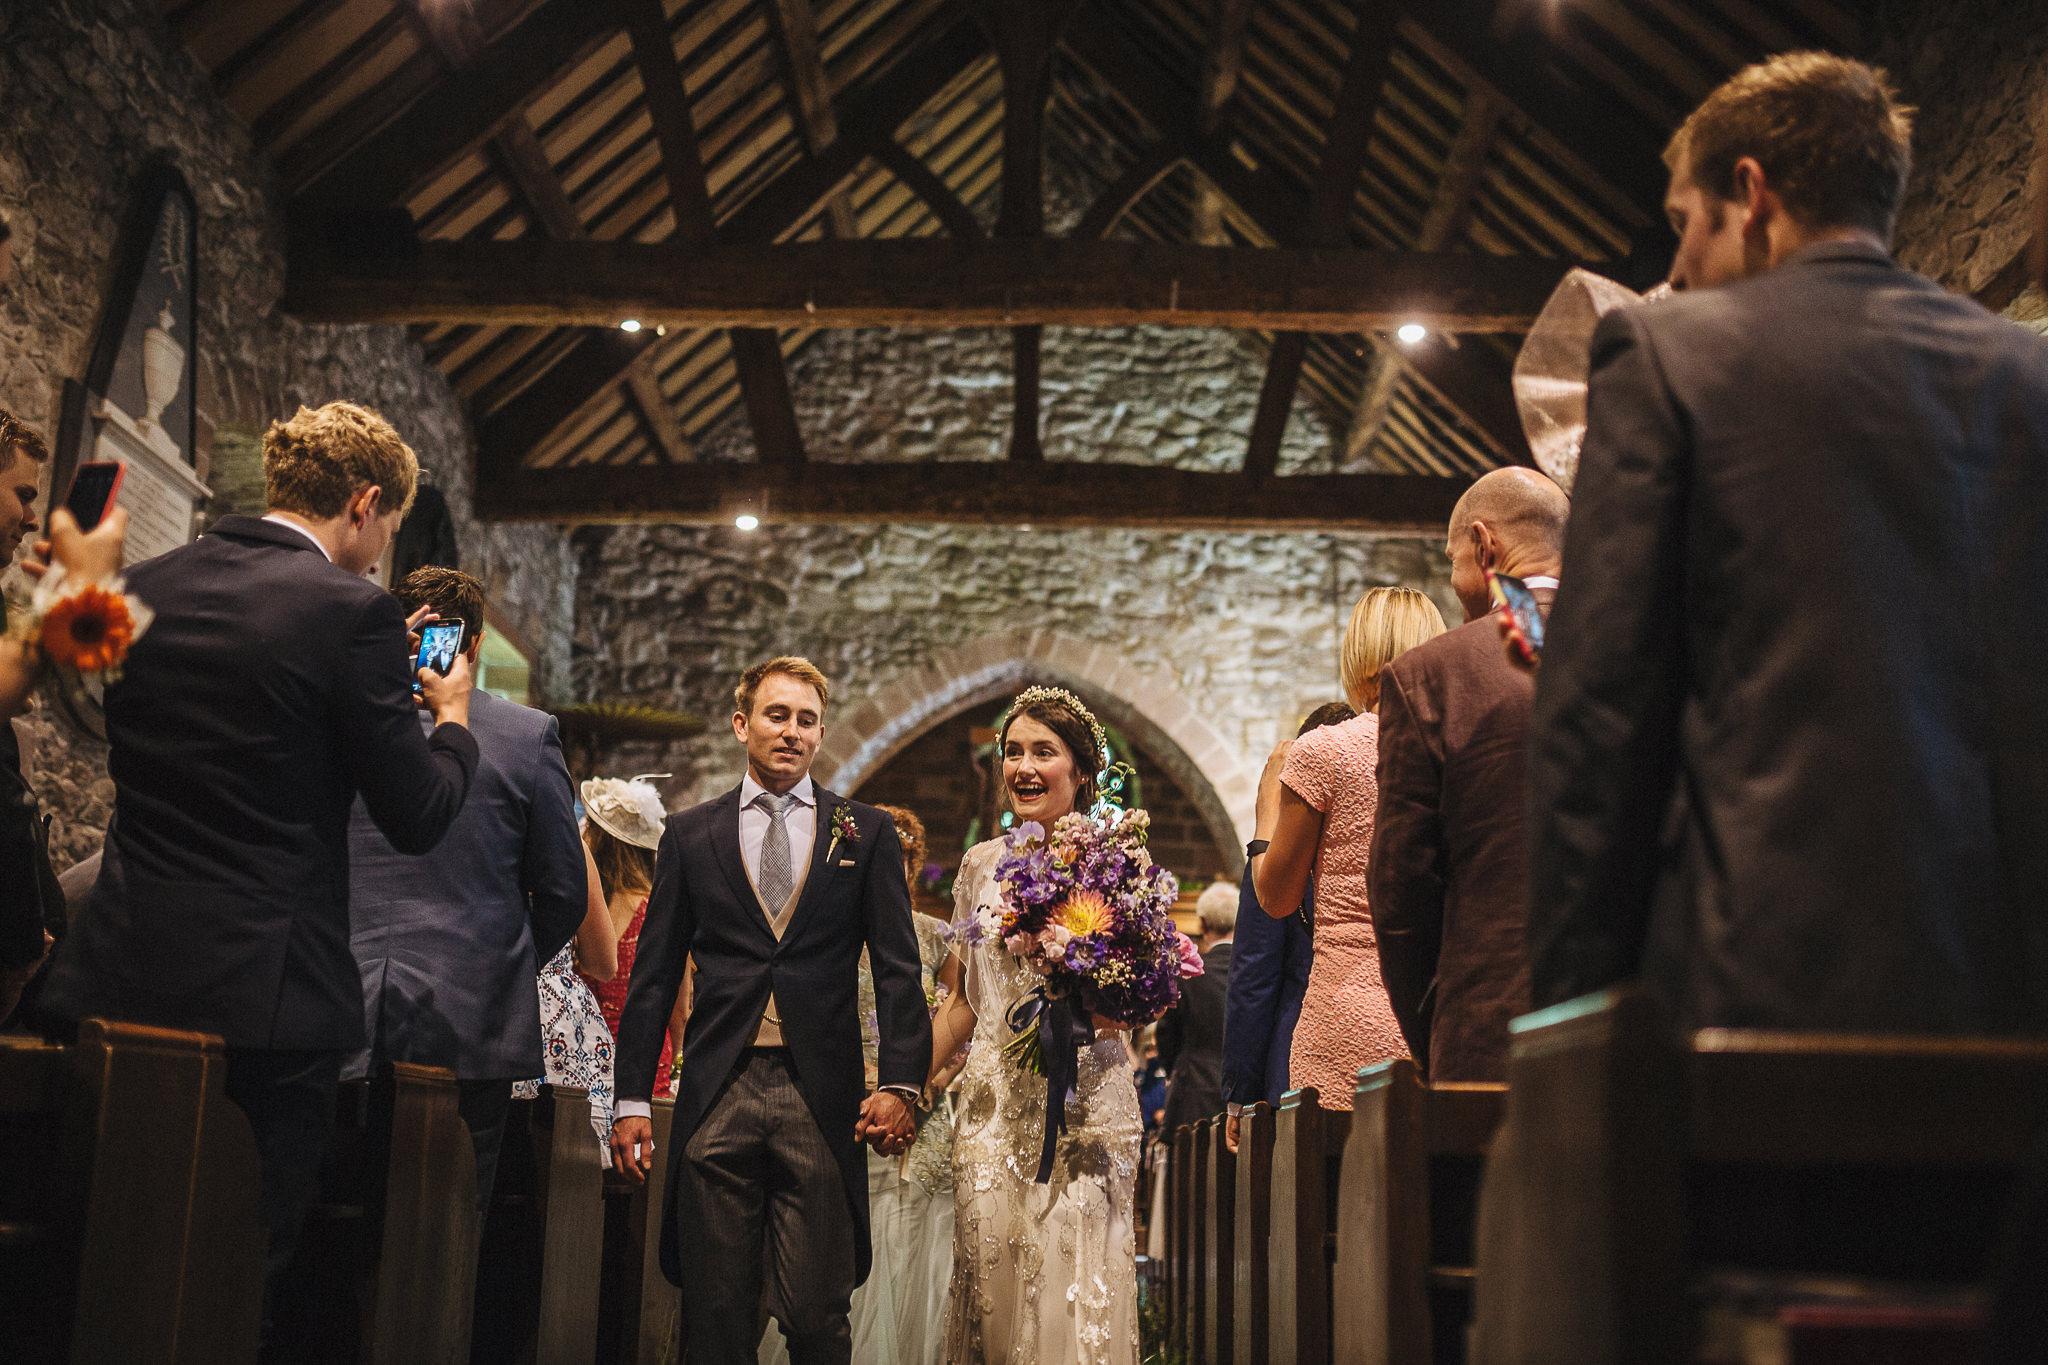 paul-marbrook-Farm-Wedding-Photographer-Lancashire-90032